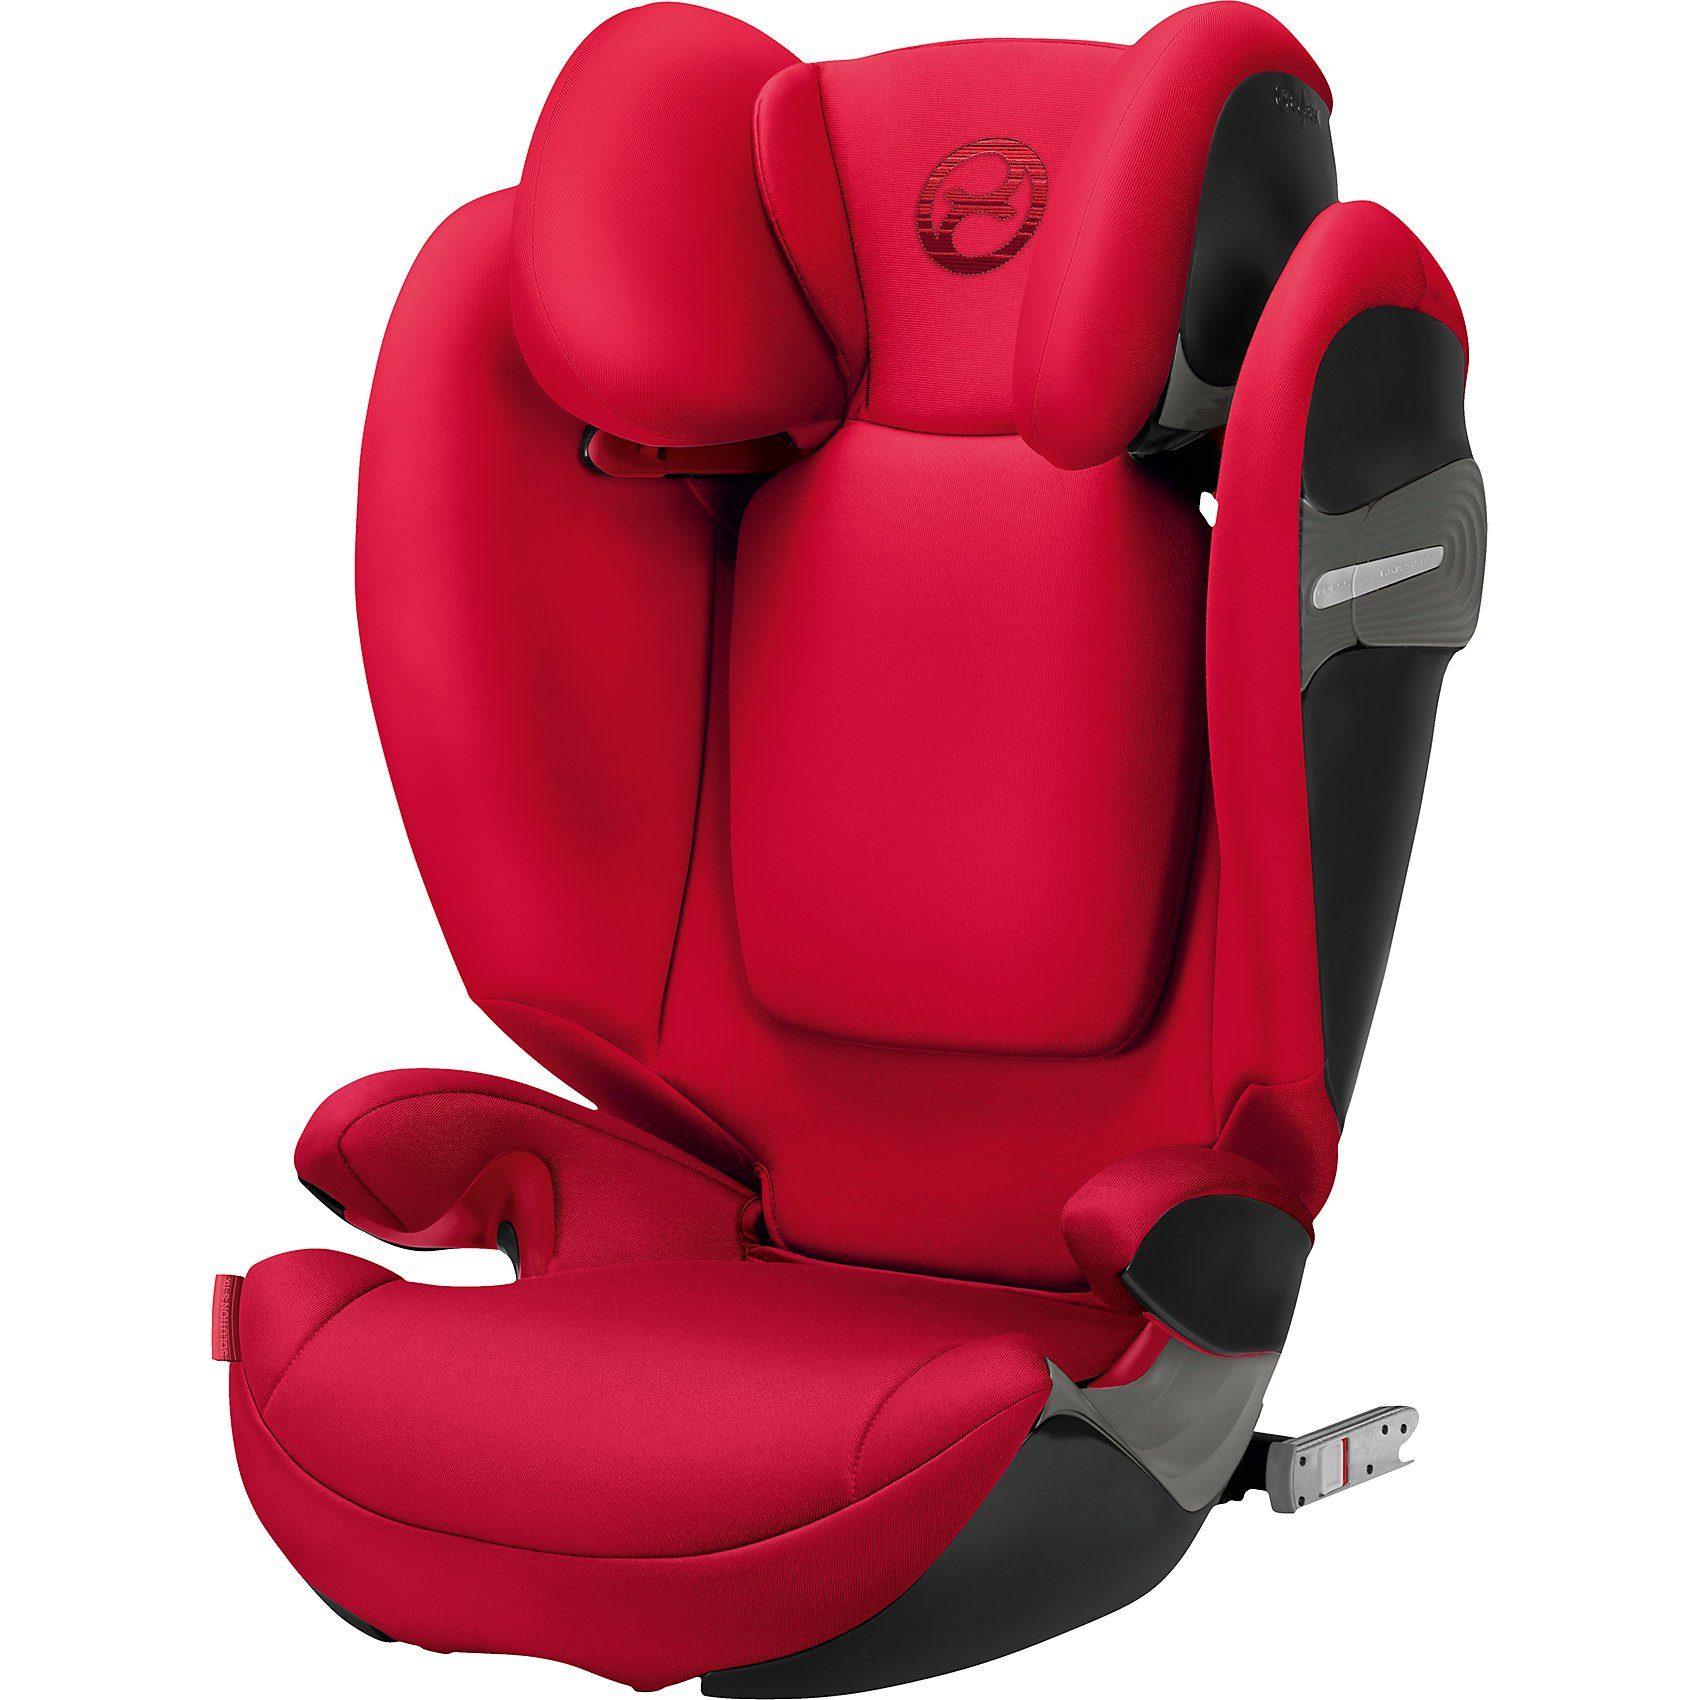 Cybex Auto-Kindersitz Solution S-Fix, Gold-Line, Rebel Red, 2018